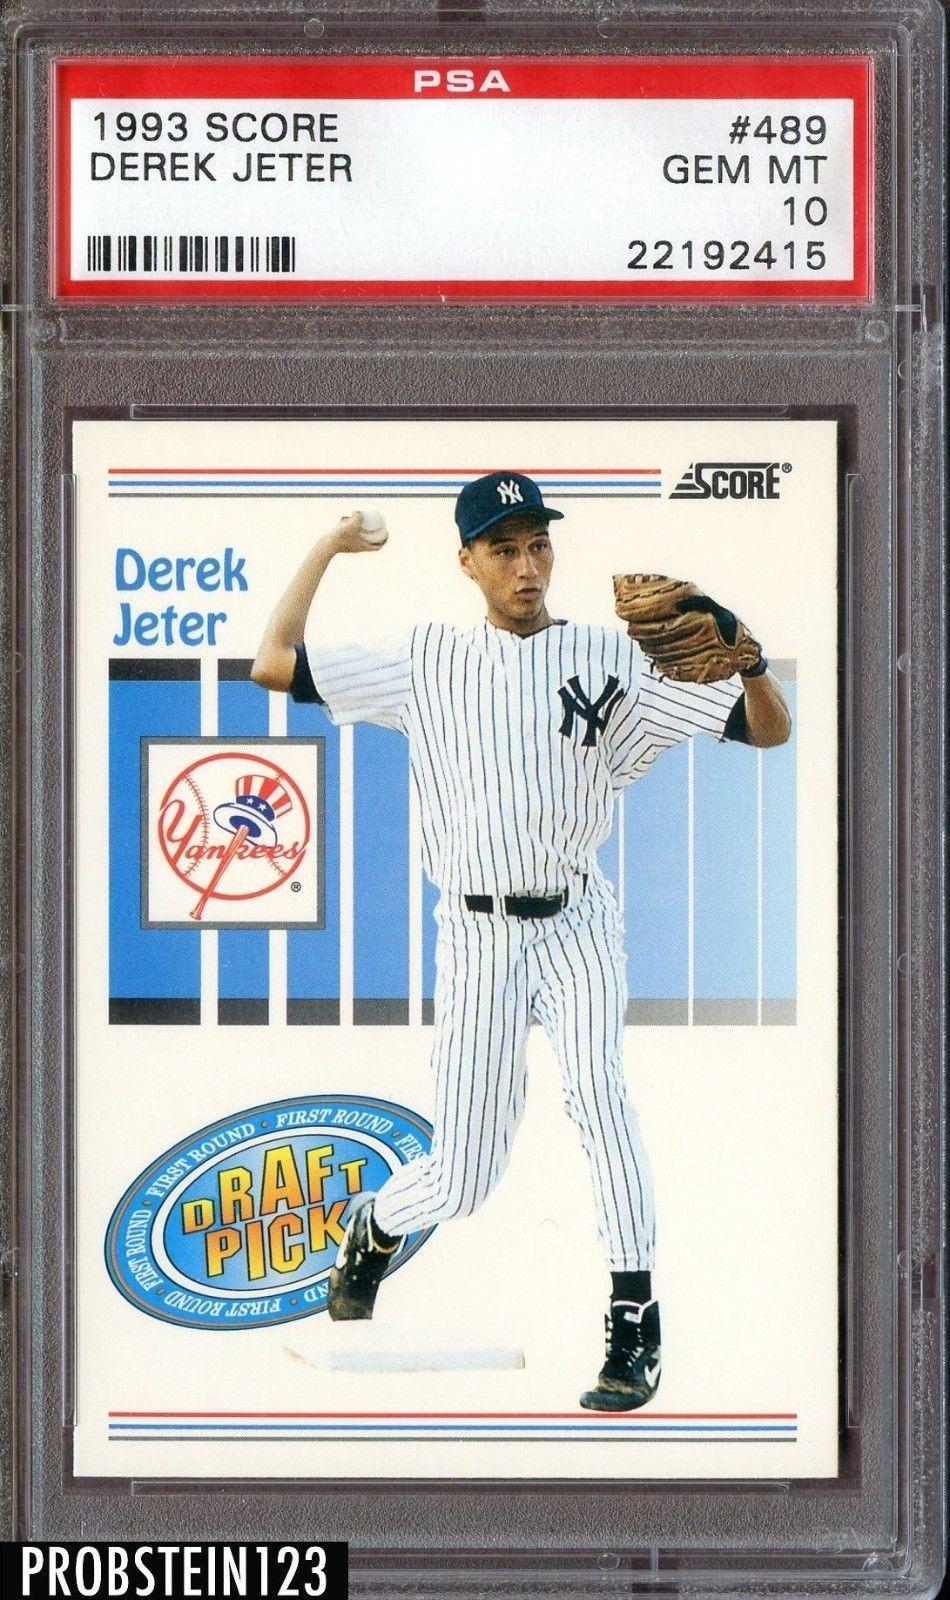 1993 score derek jeter derek jeter rookie card new